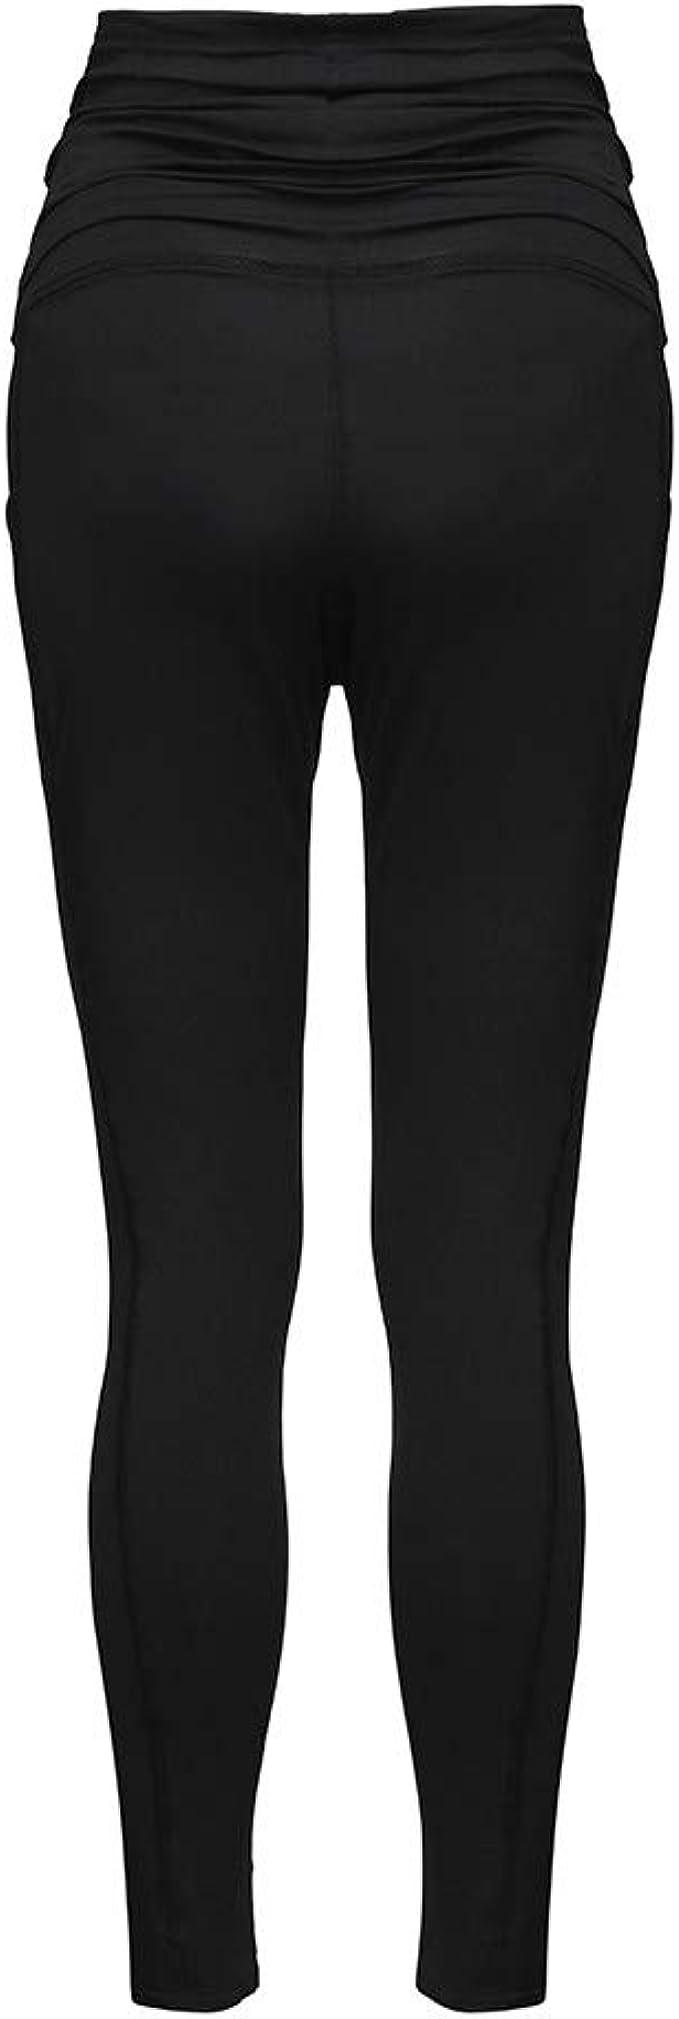 QinMMROPA Pantalones Premamá Leggings Banda para Mujer Embarazada ...